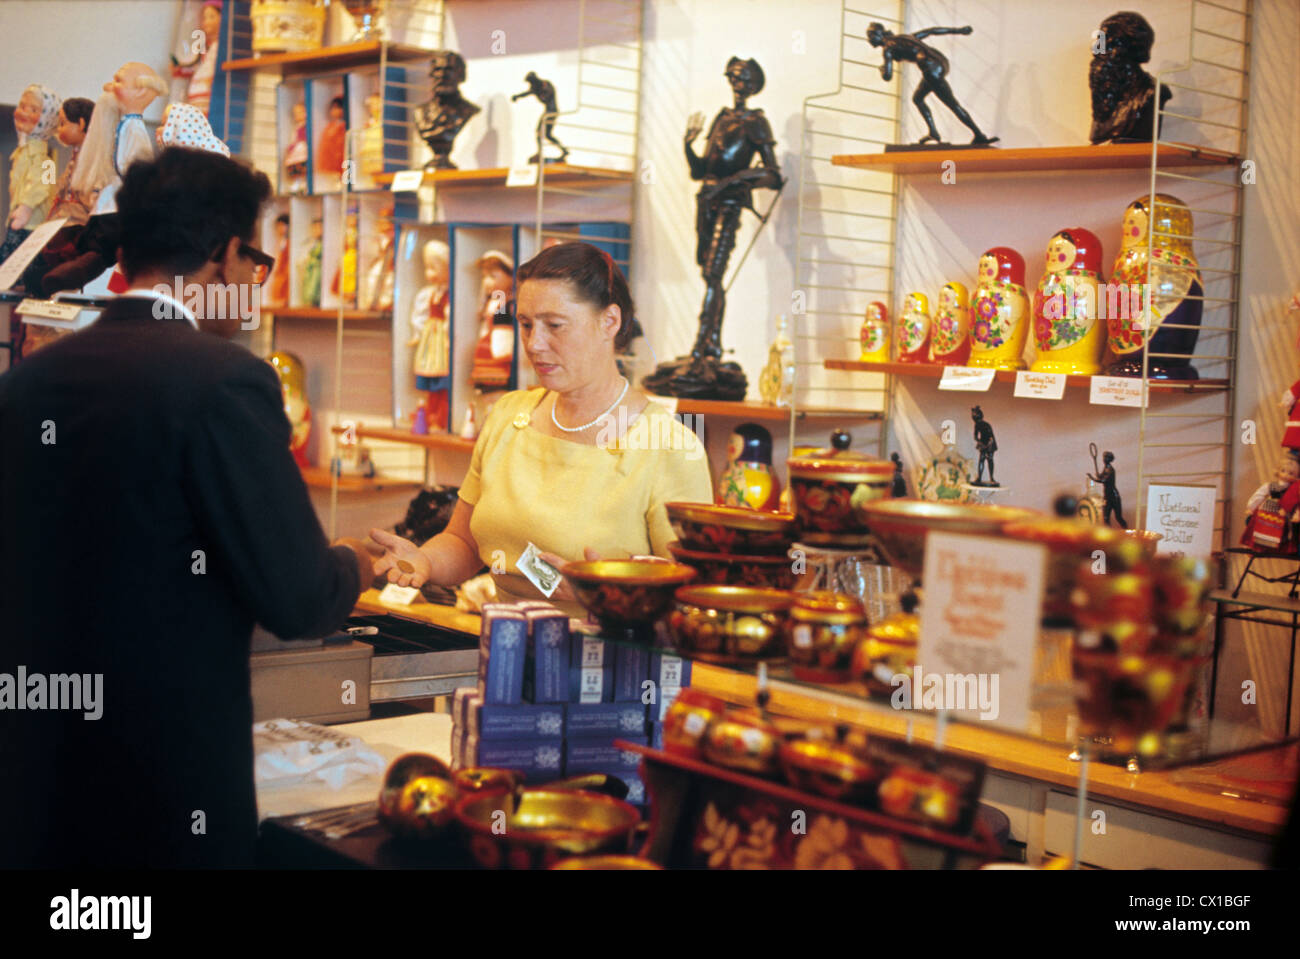 Londres. La Grande-Bretagne. Un magasin de souvenirs à Holborn Street. TASS Photo / Viktor Budan . . . / / Banque D'Images